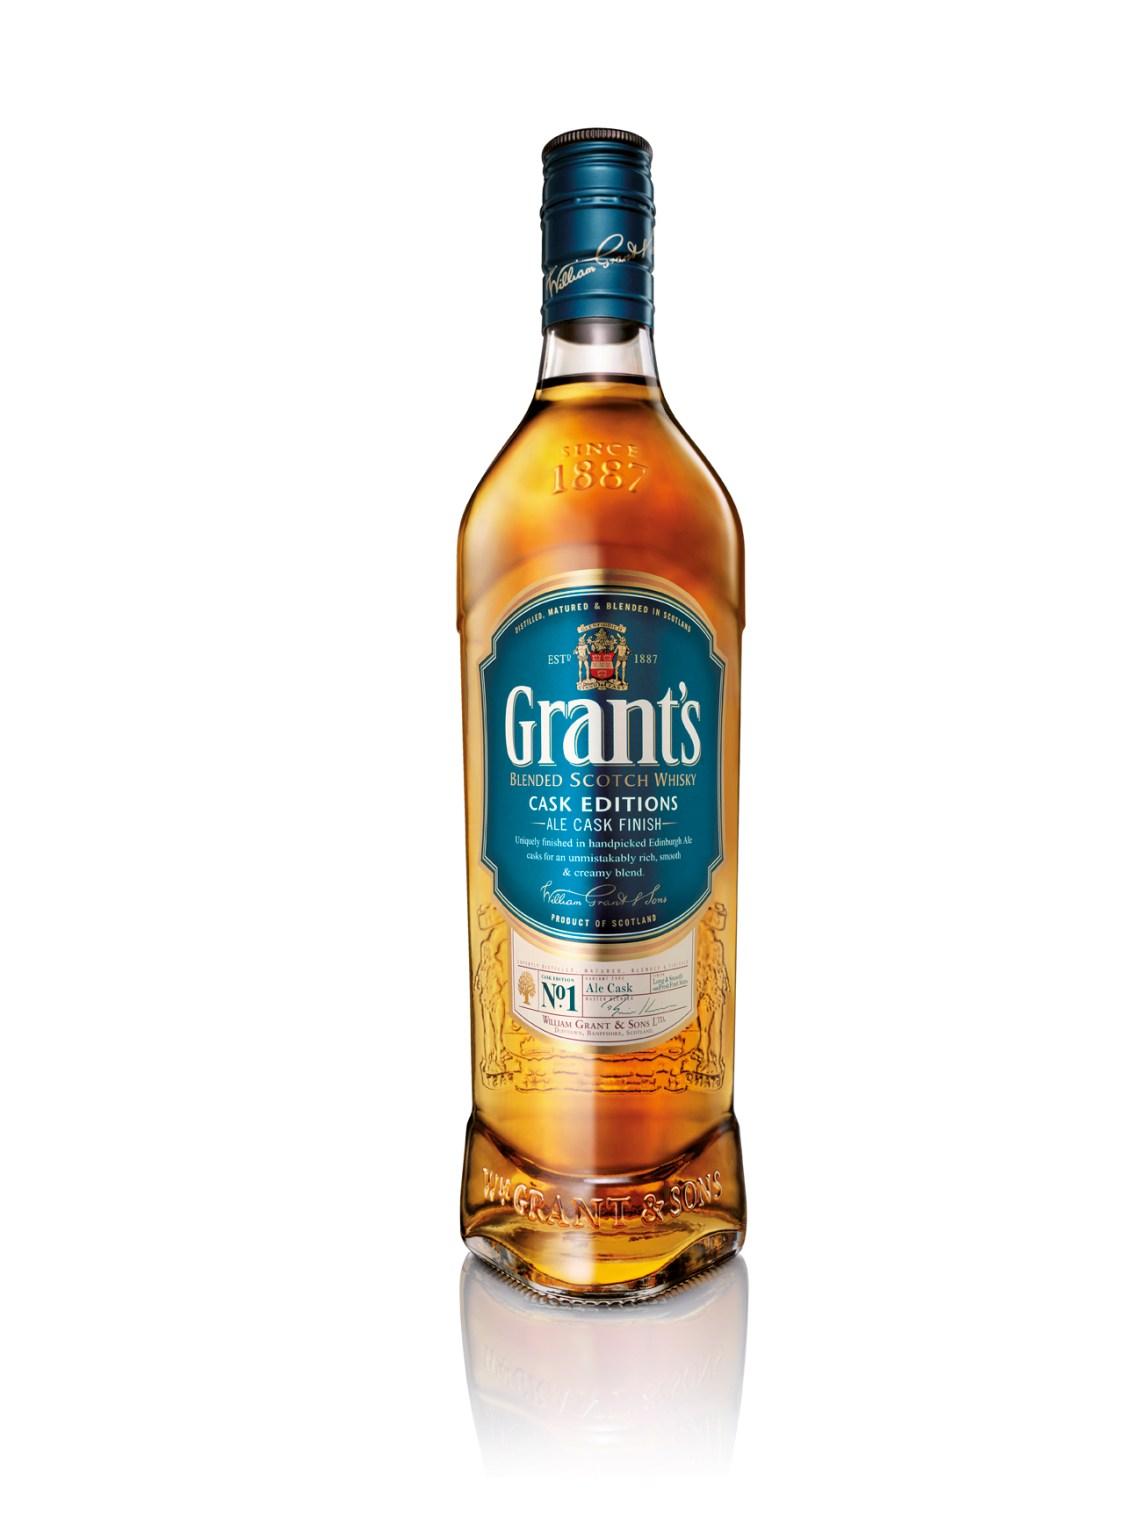 Grant's Blended Scotch Ale Cask Finish